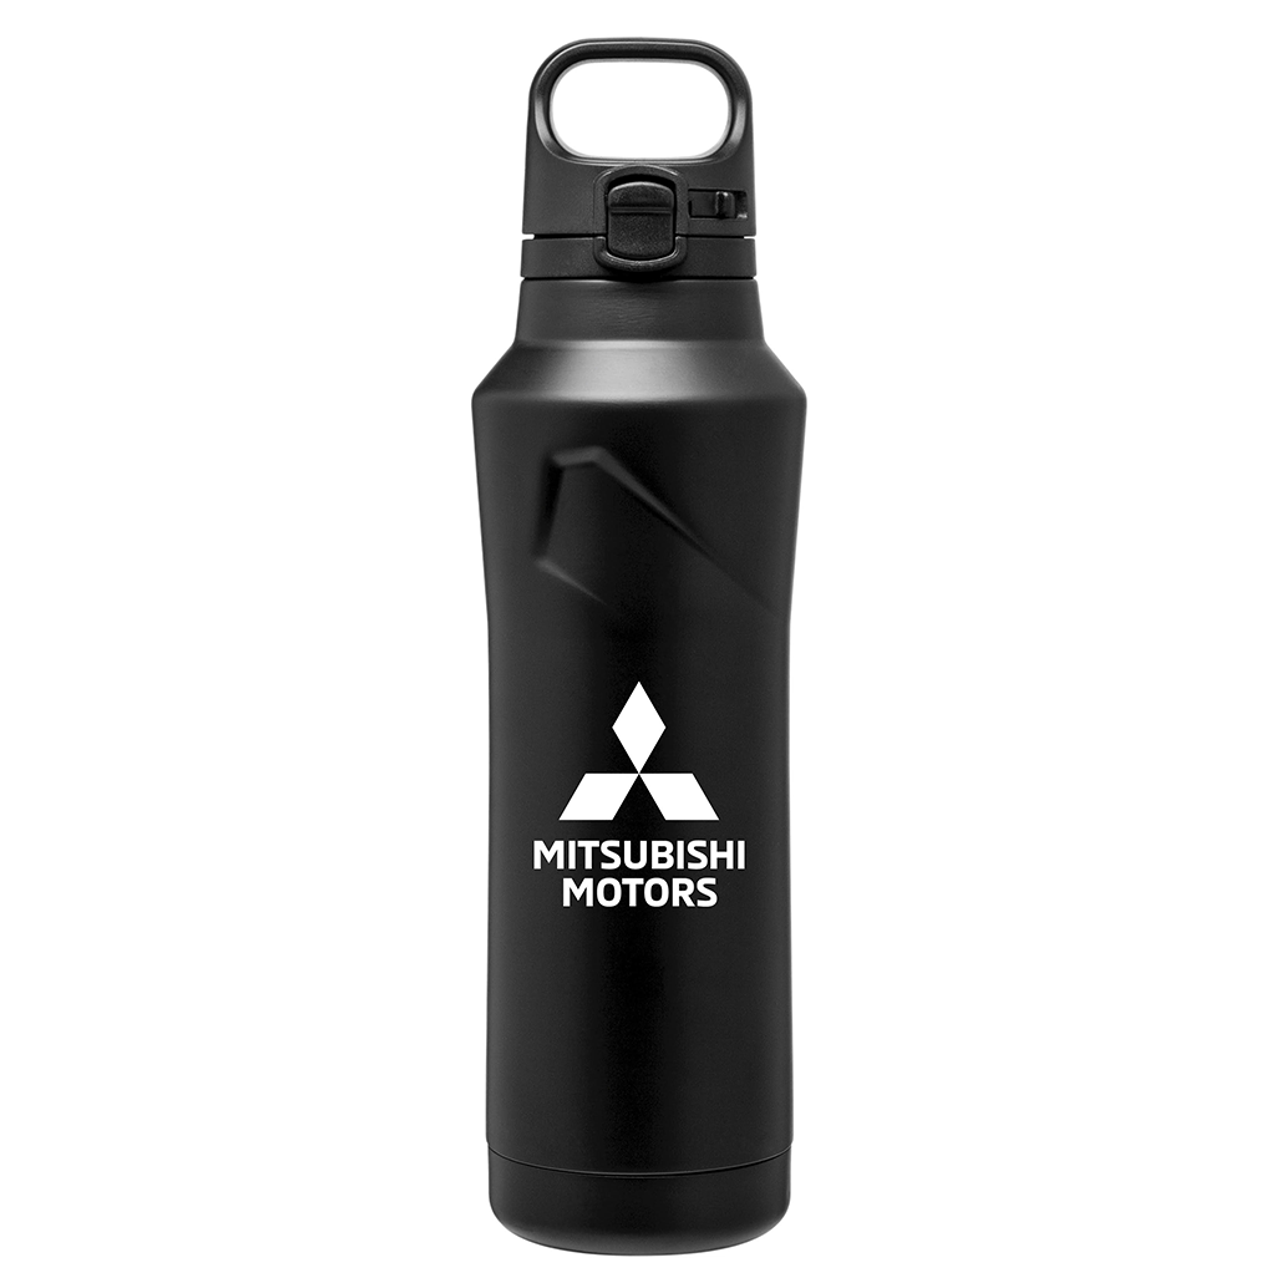 Insulated Sport Bottle - 20.9oz